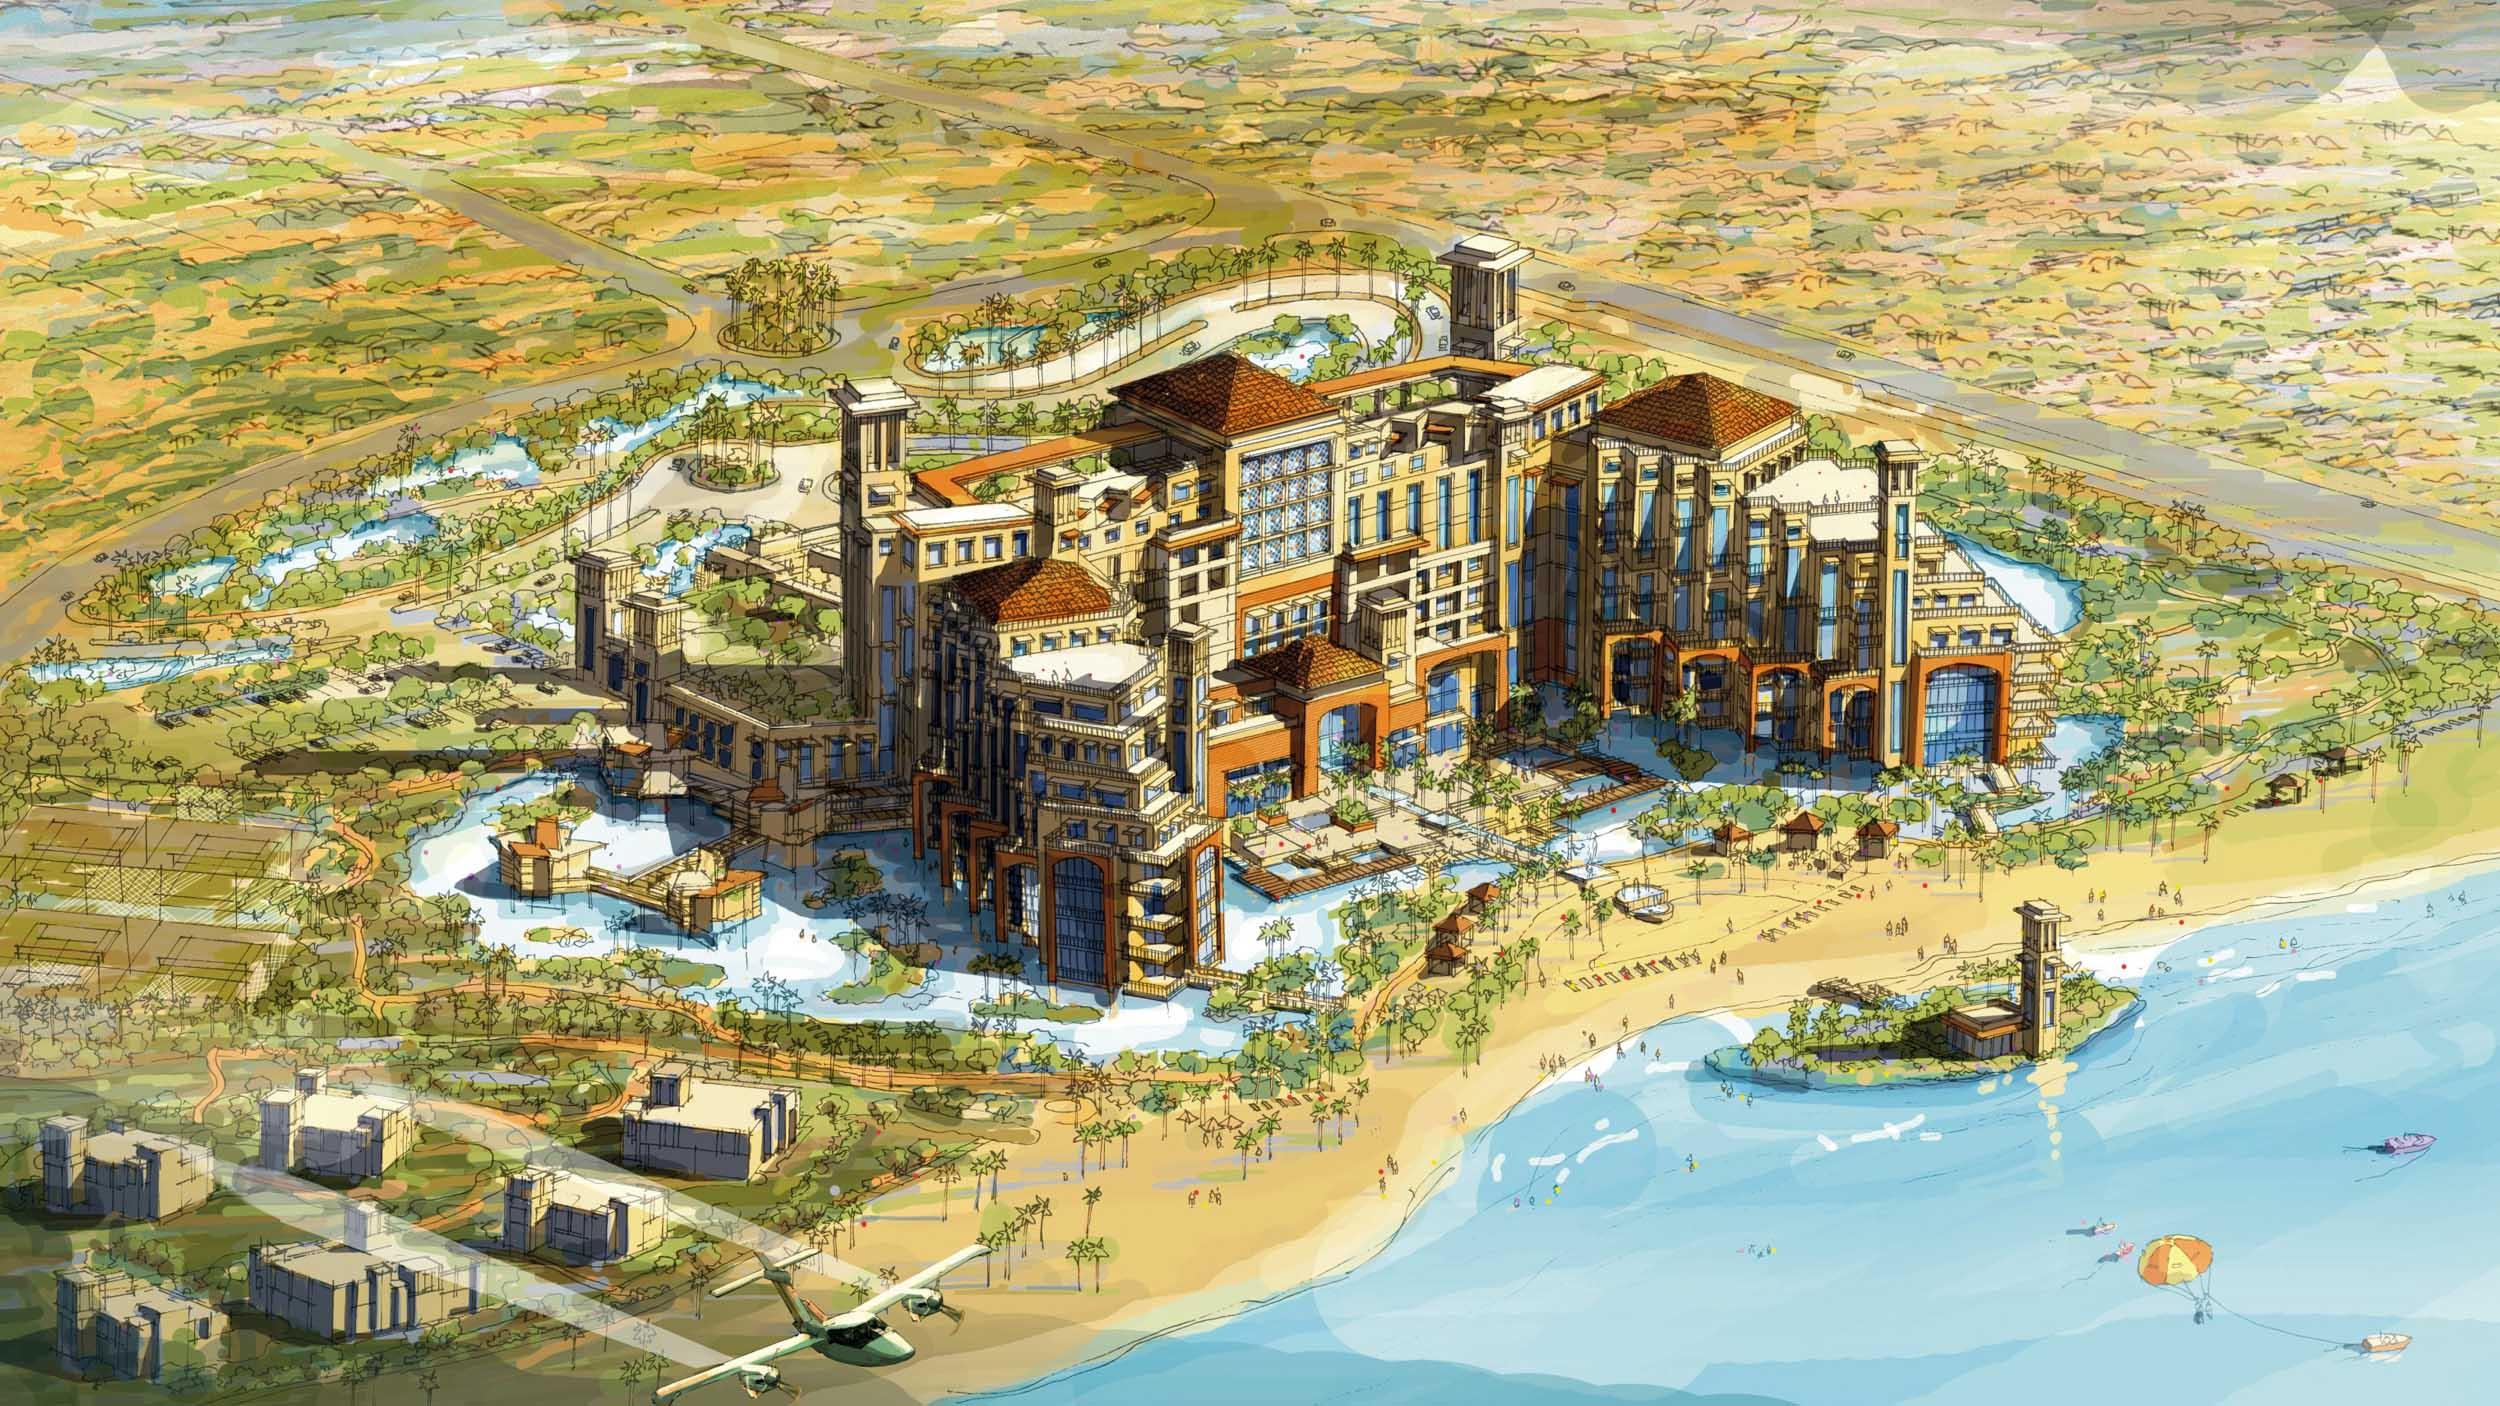 AL HAMRA WATERS - Ras Al Khaimah, UAE